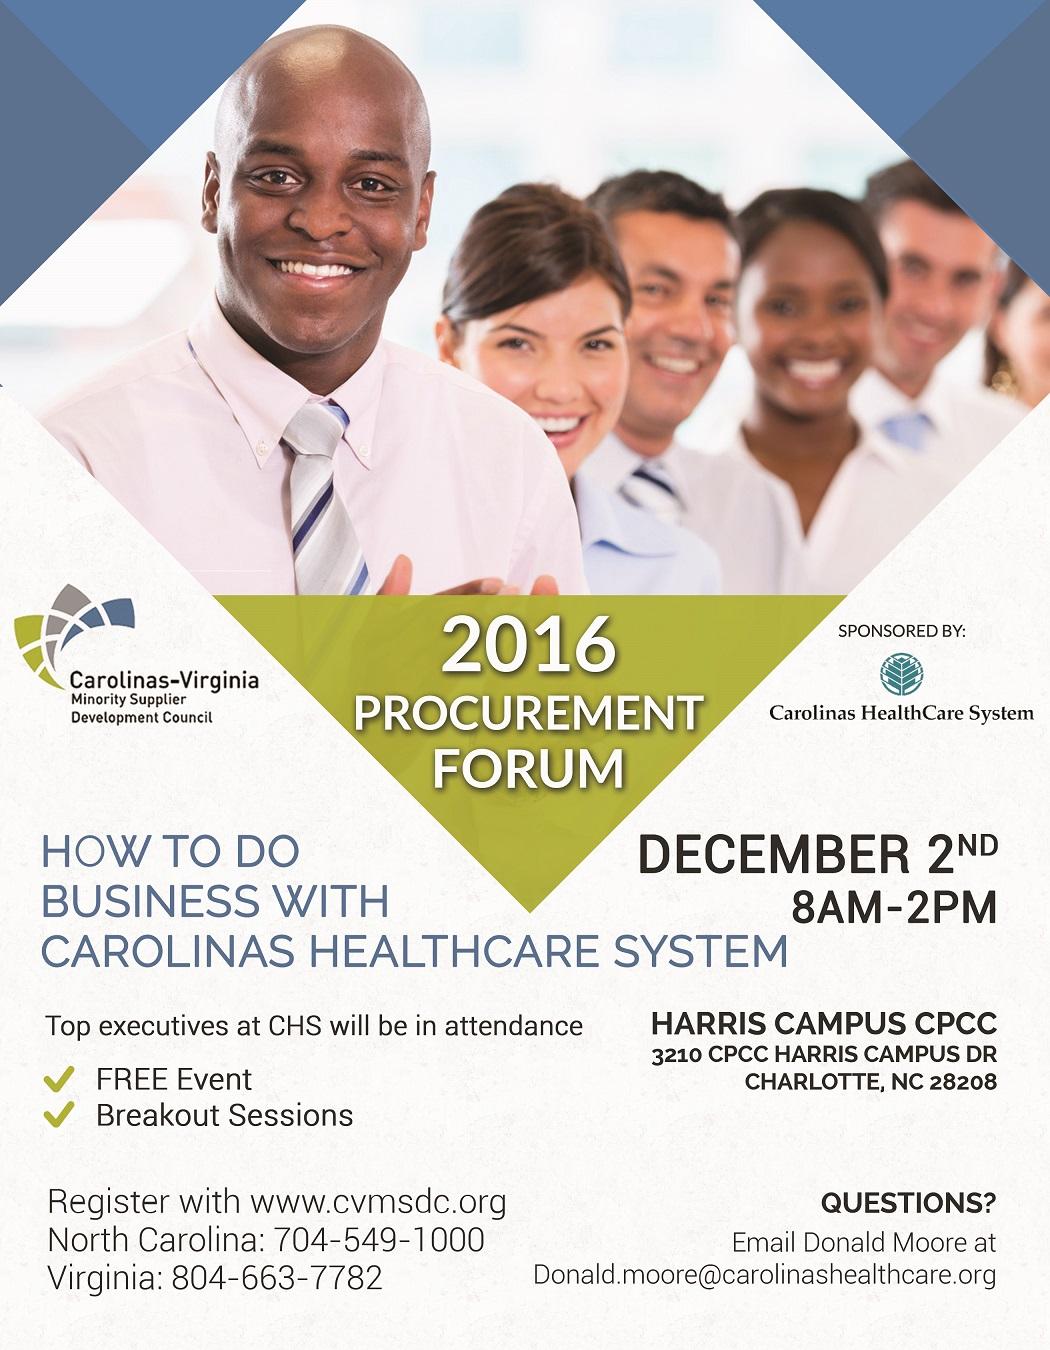 2016 PRocurement Forum